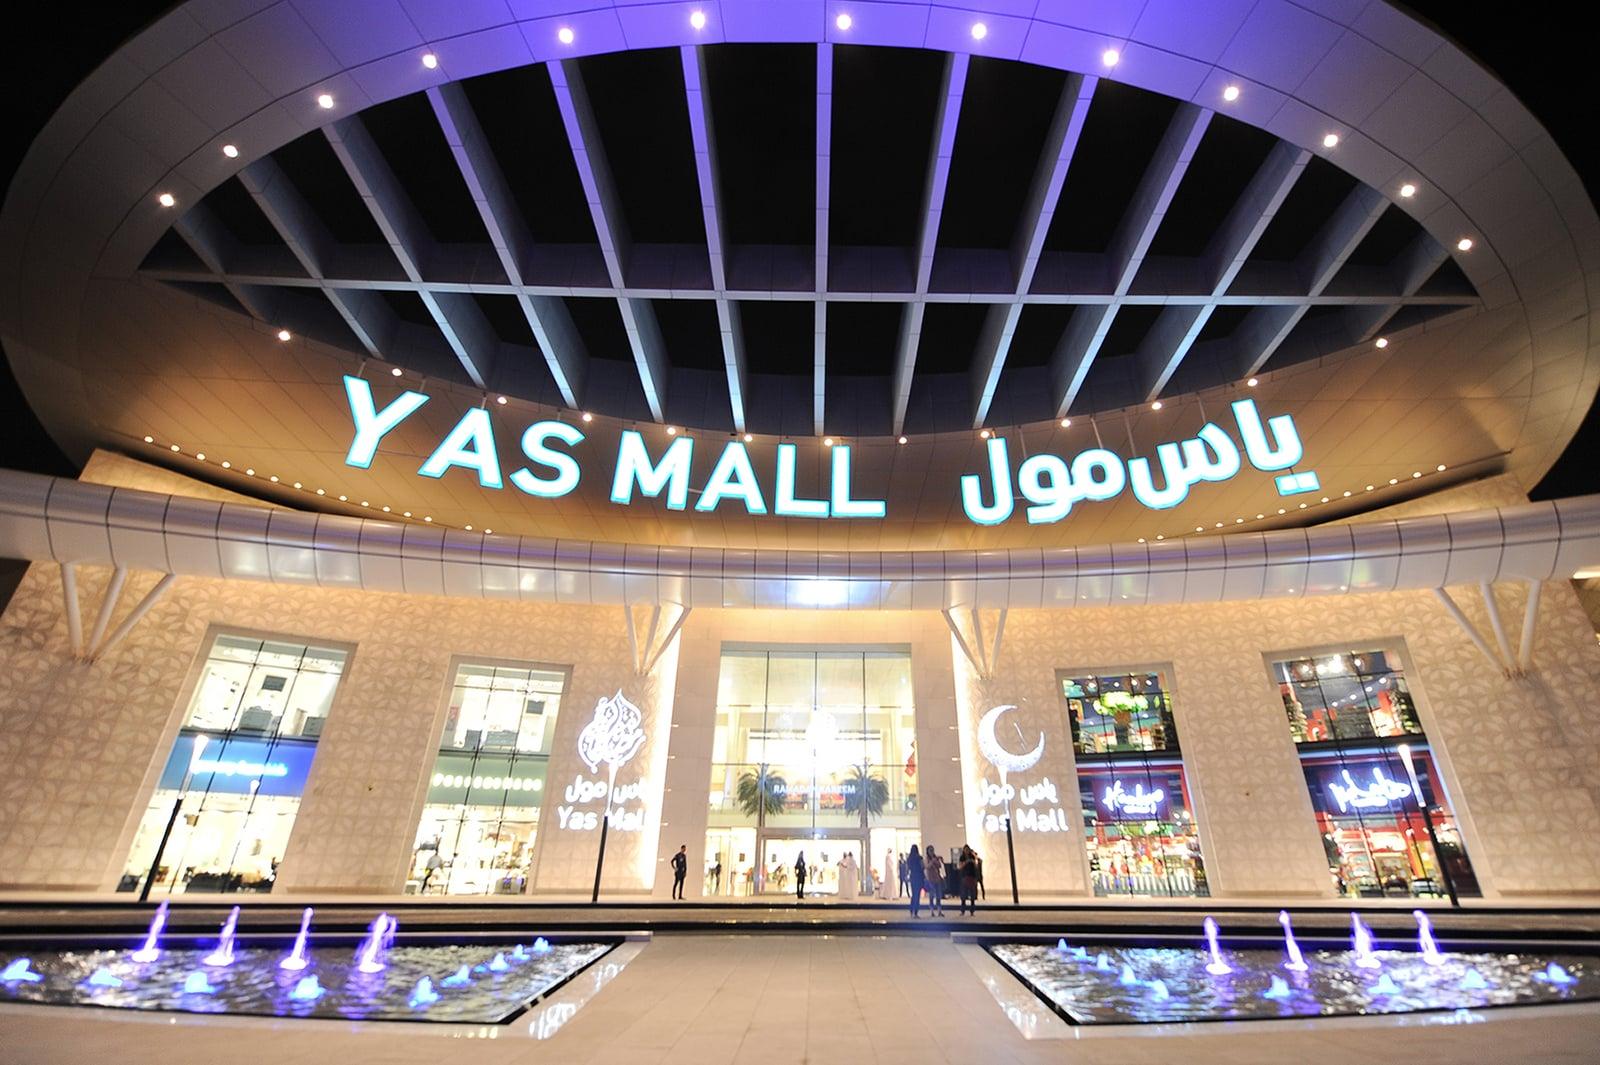 Yas Mall Abu Dhabi Open 24 Hours For A Mega Eid Sale Popsugar Middle East Smart Living